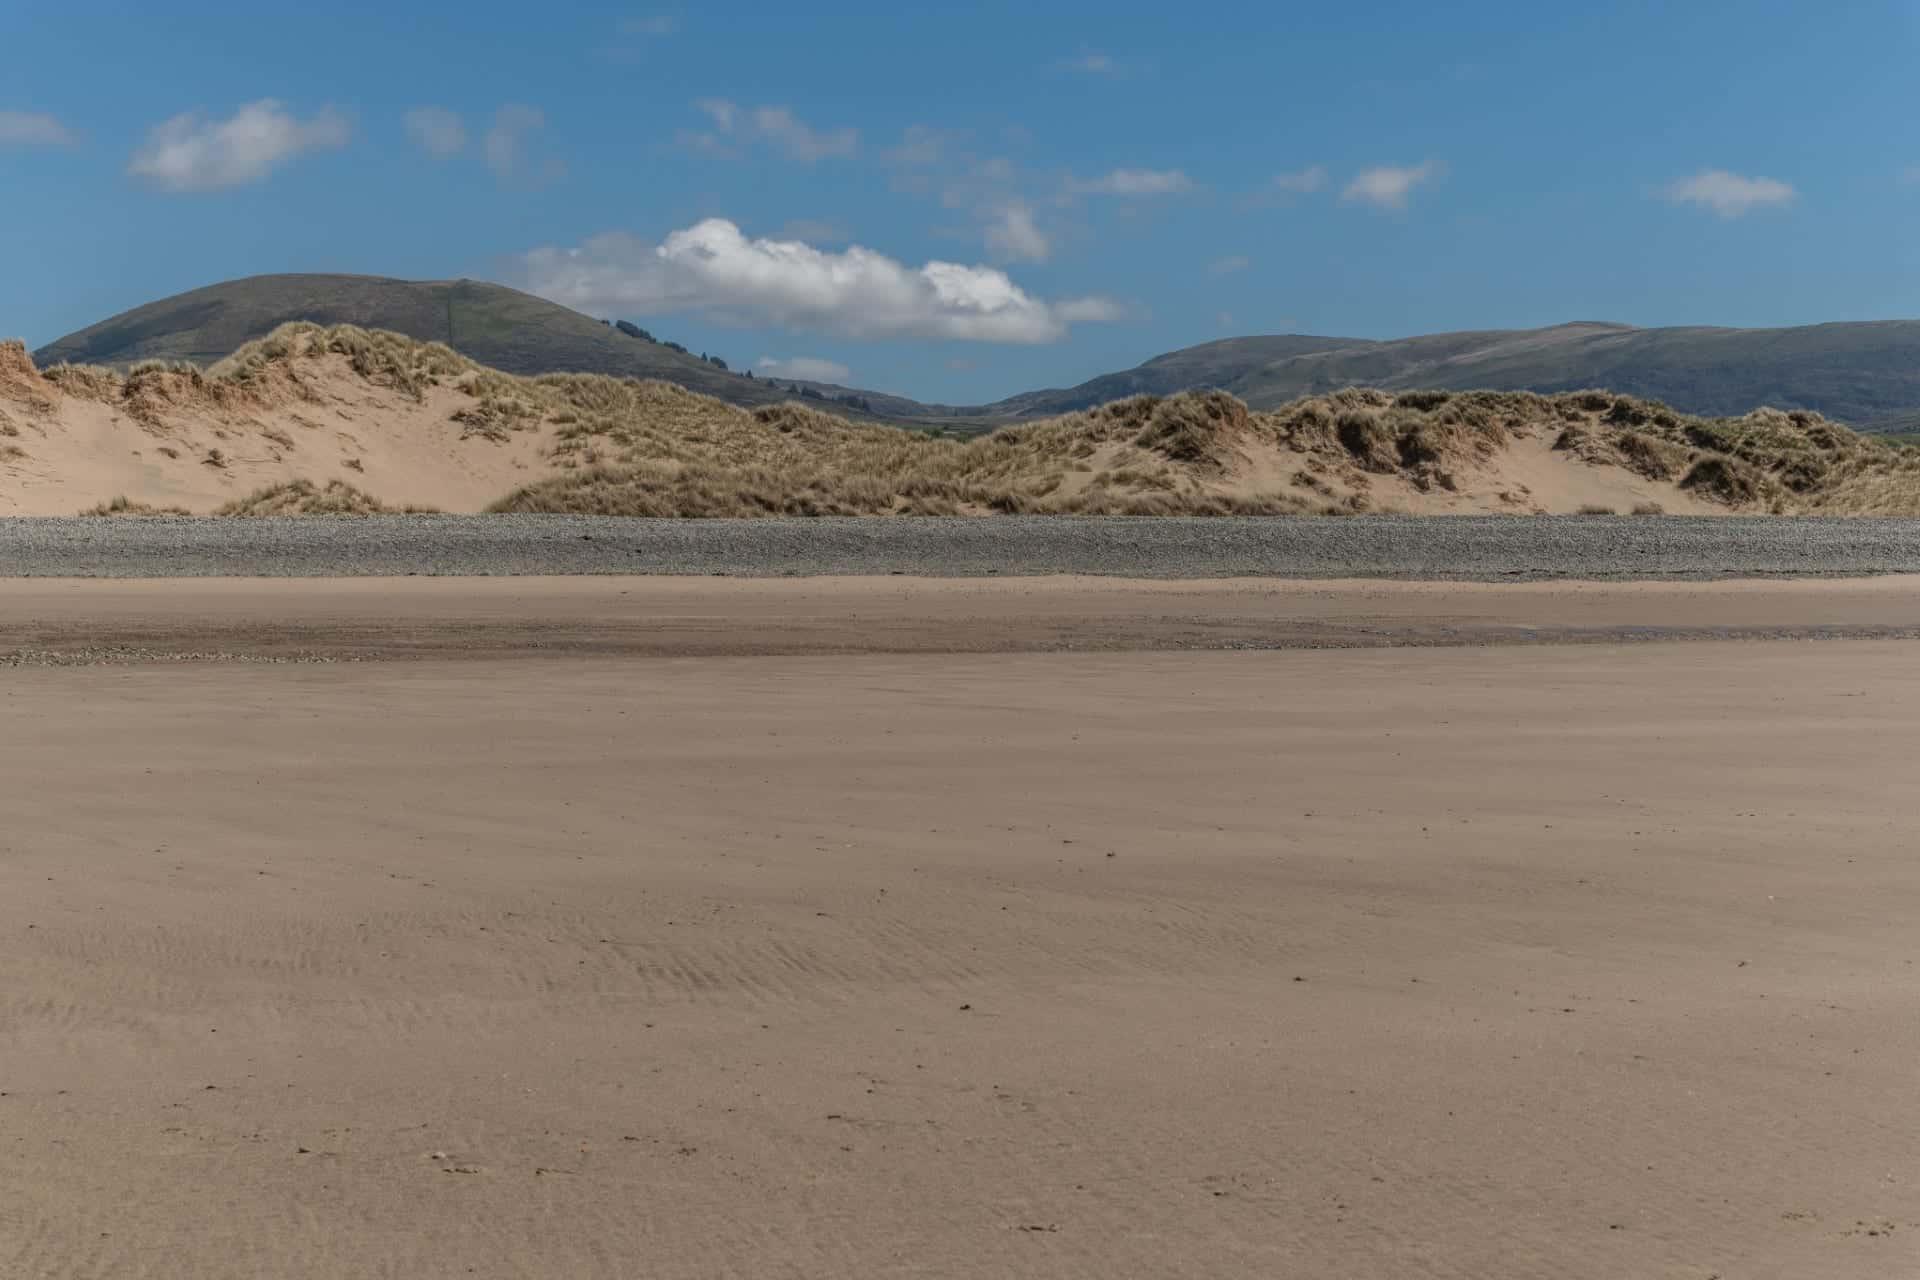 Morfa Dyffryn Nudist beach